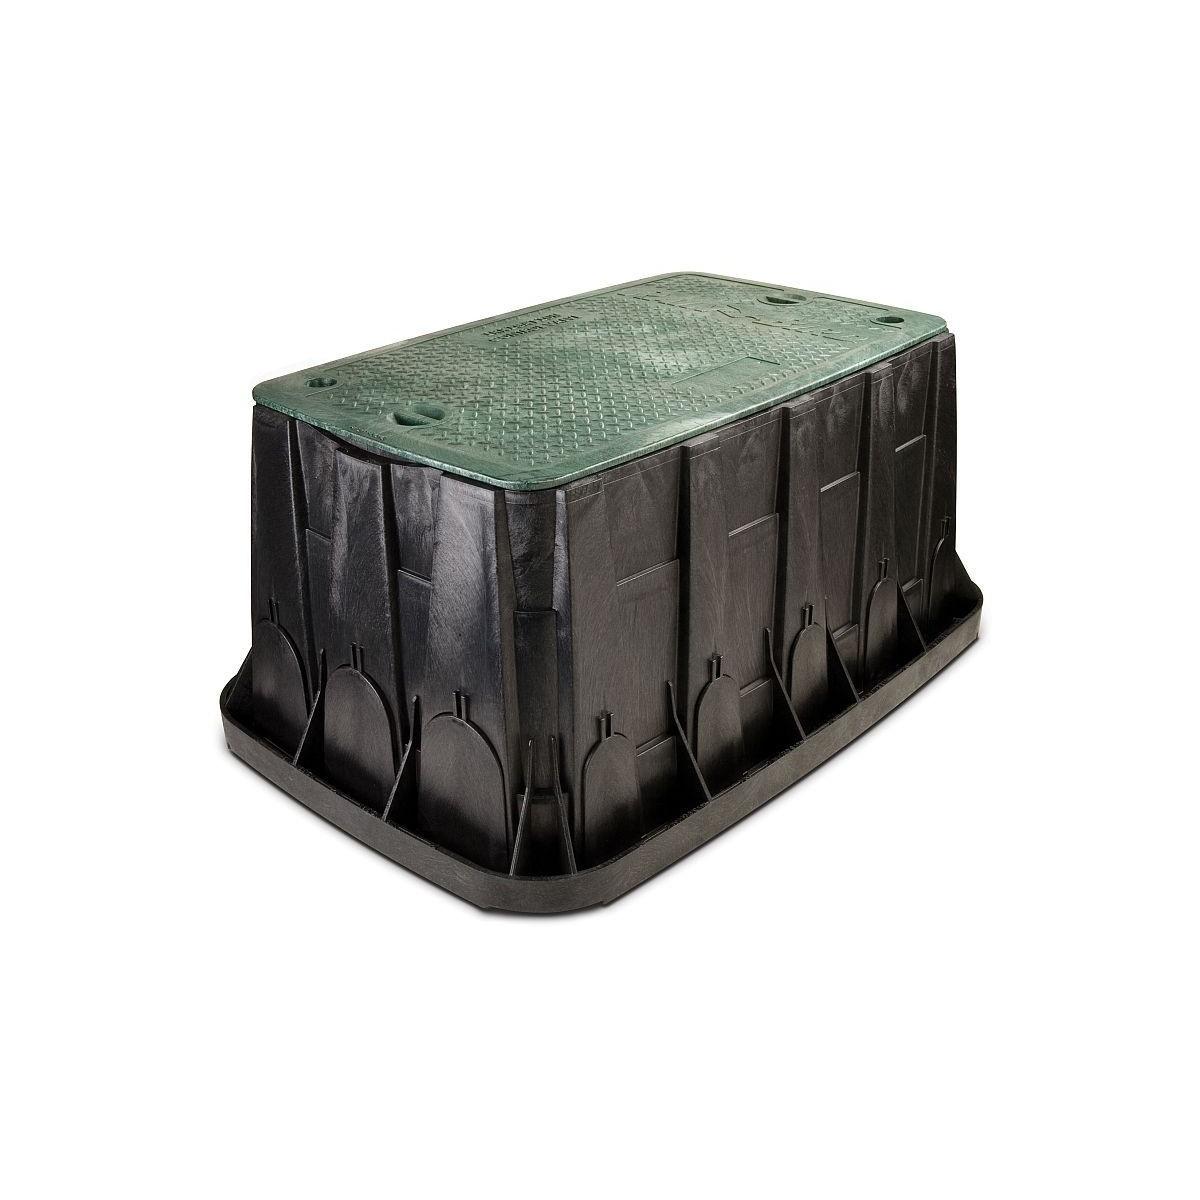 Arqueta hdpe rainbird rectangular maxi jumbo + cierre.102.4x68.8x45.7